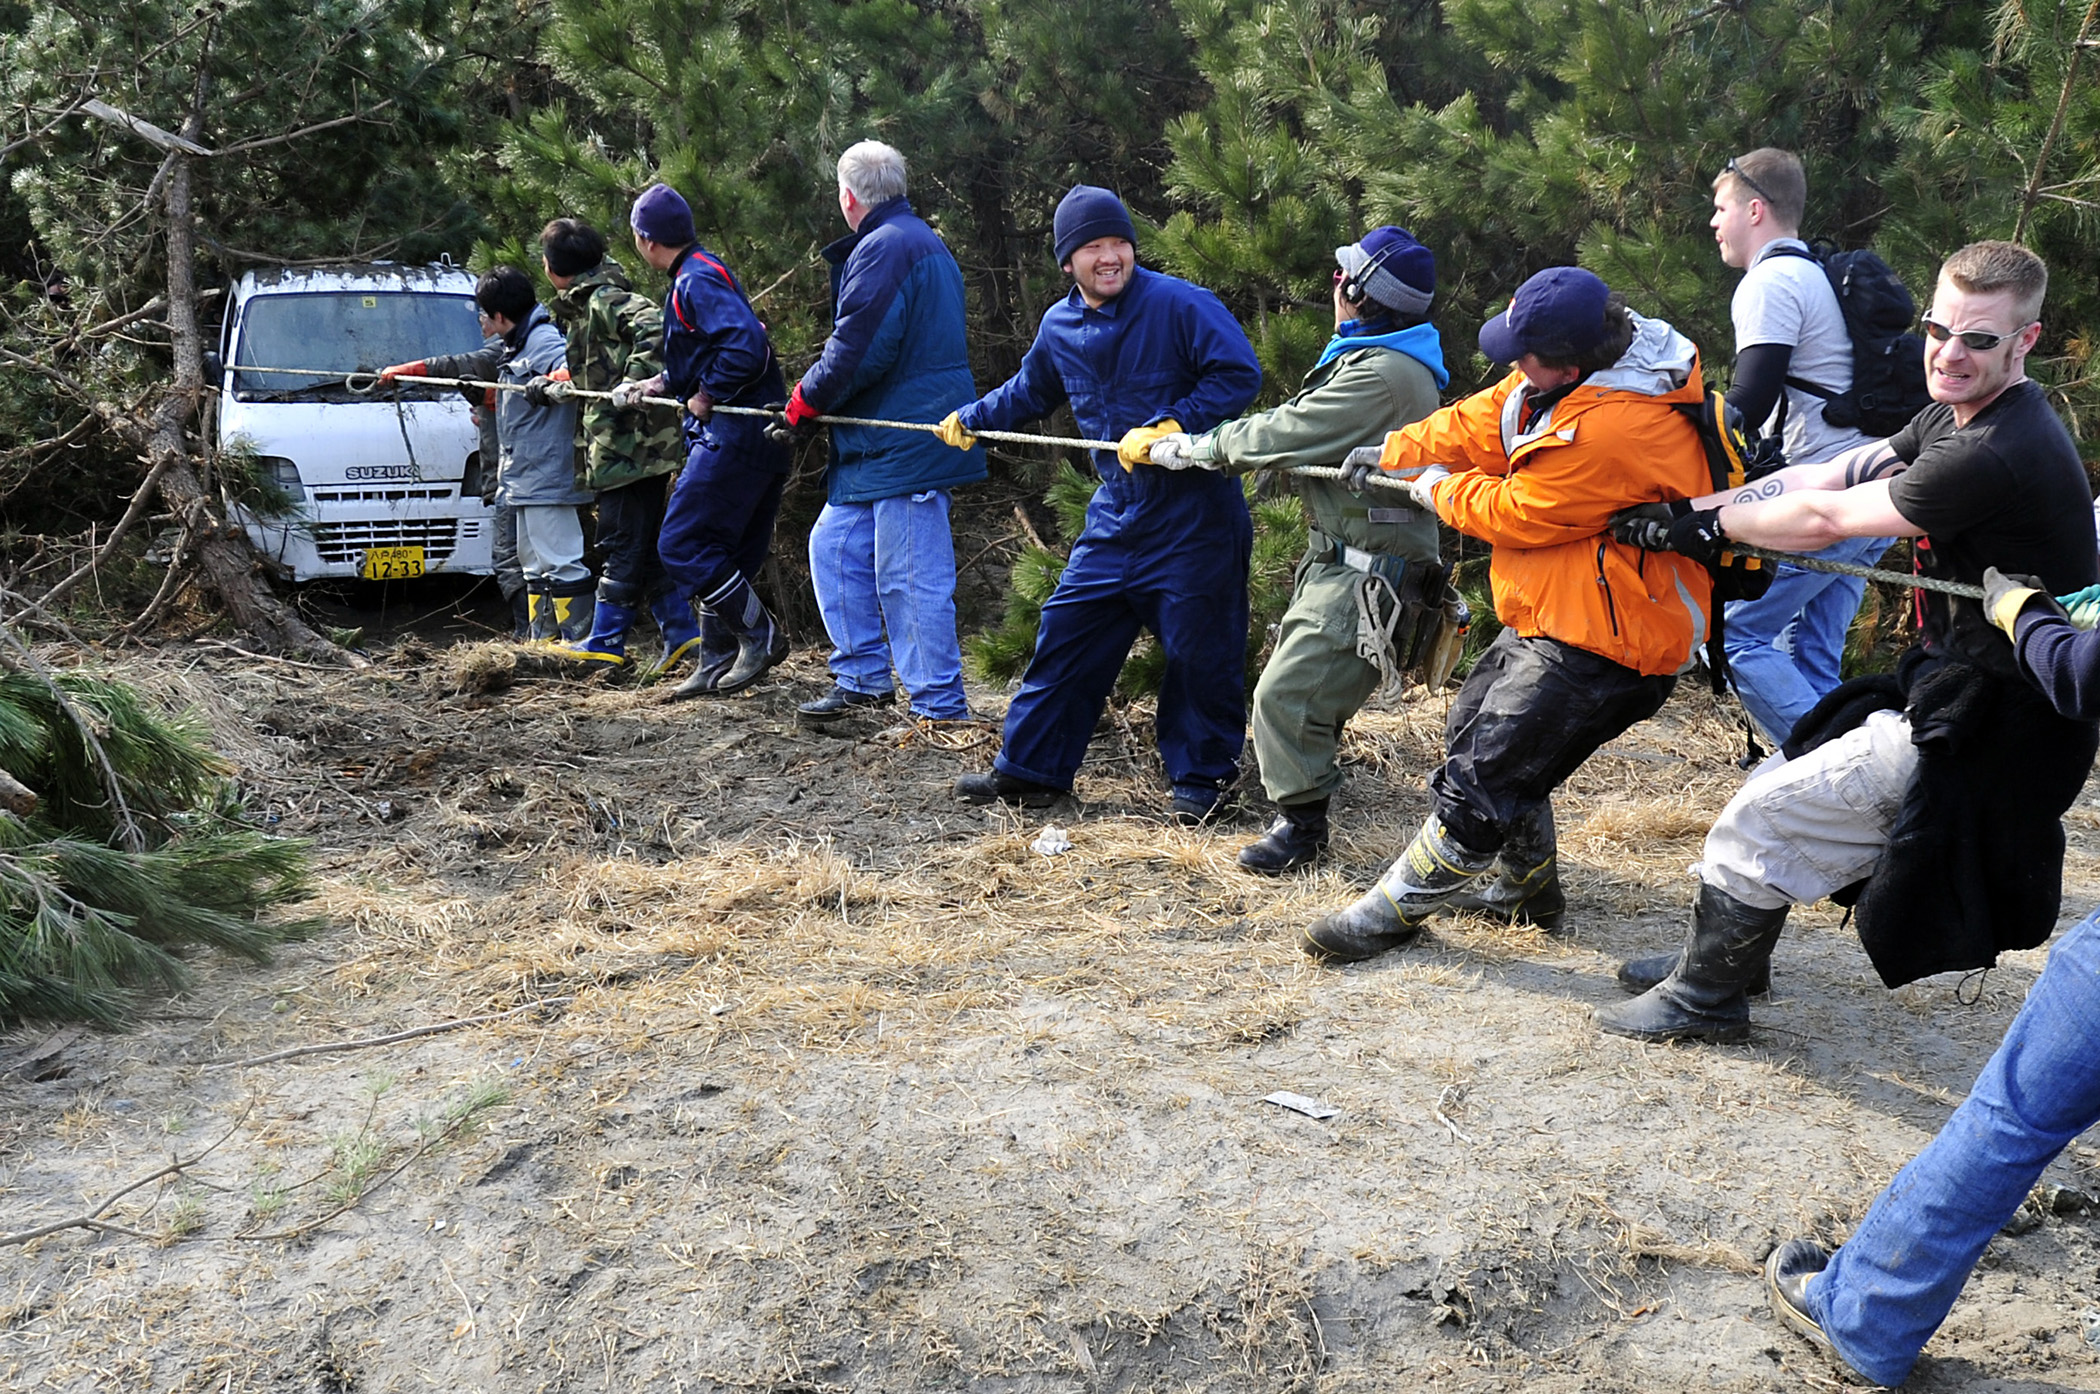 Humanitarian response to the 2011 Tōhoku earthquake and tsunami